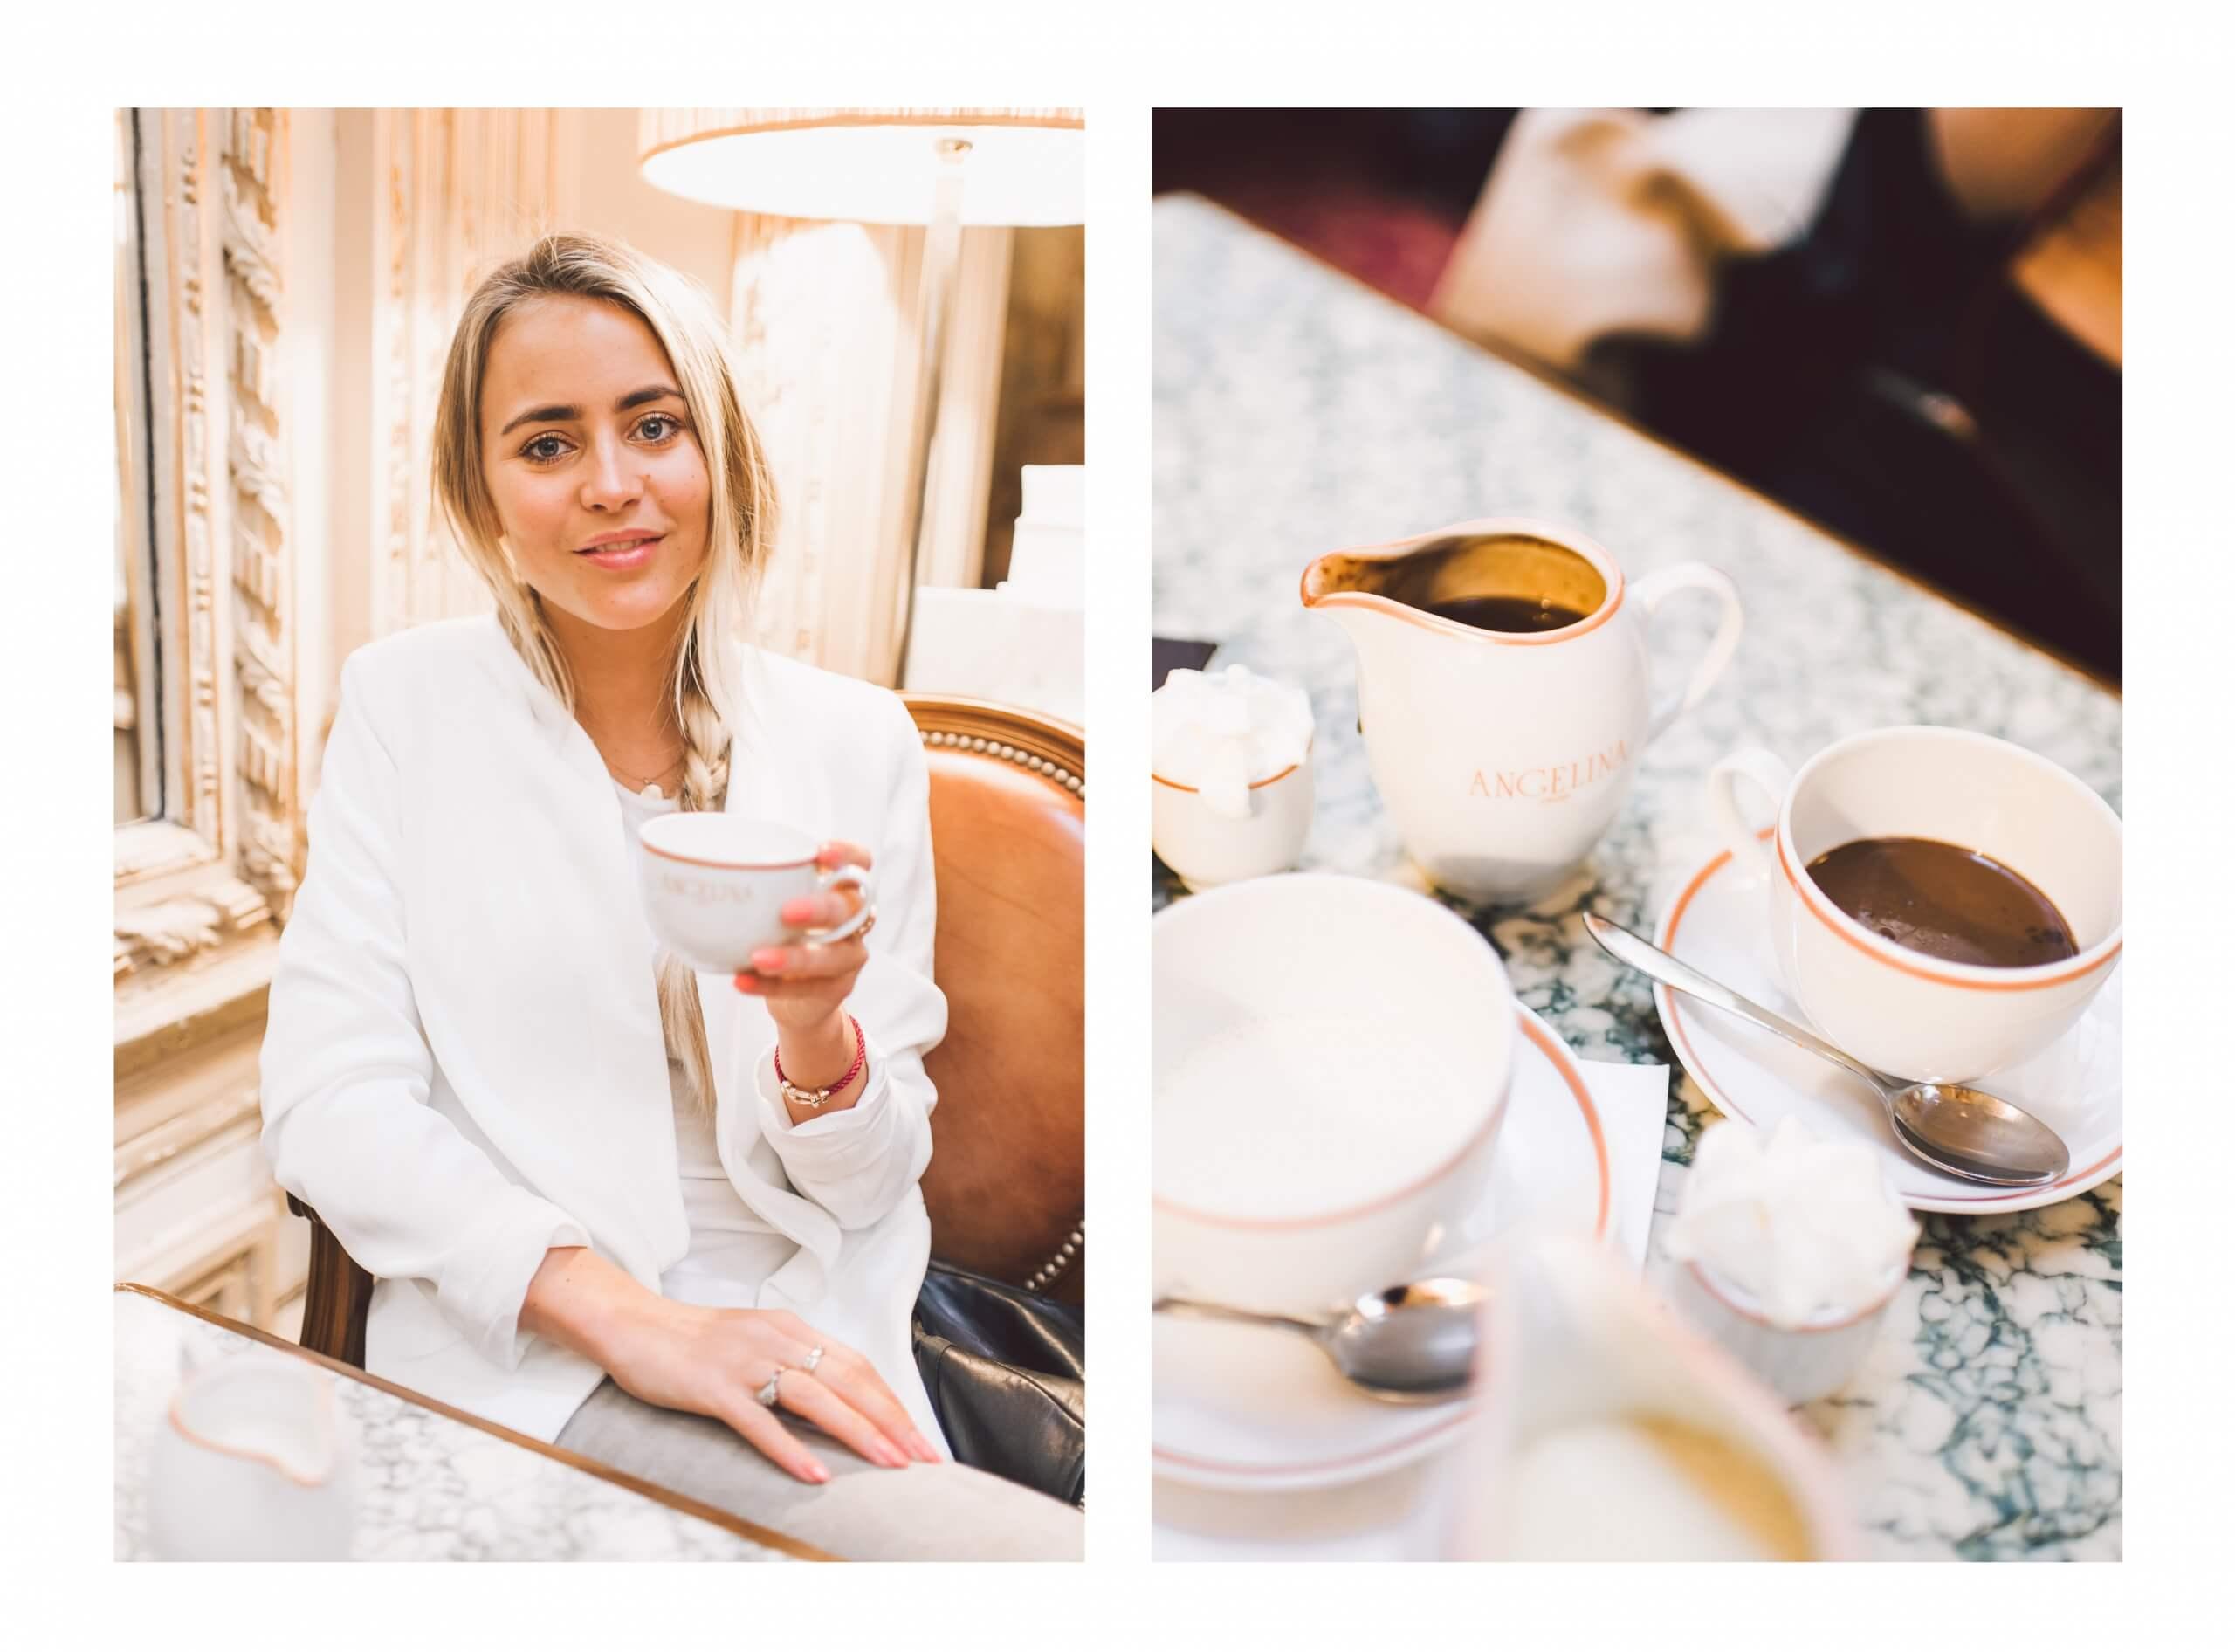 janni-deler-hot-chocolate-angelinas-parisDSC_2398 copy